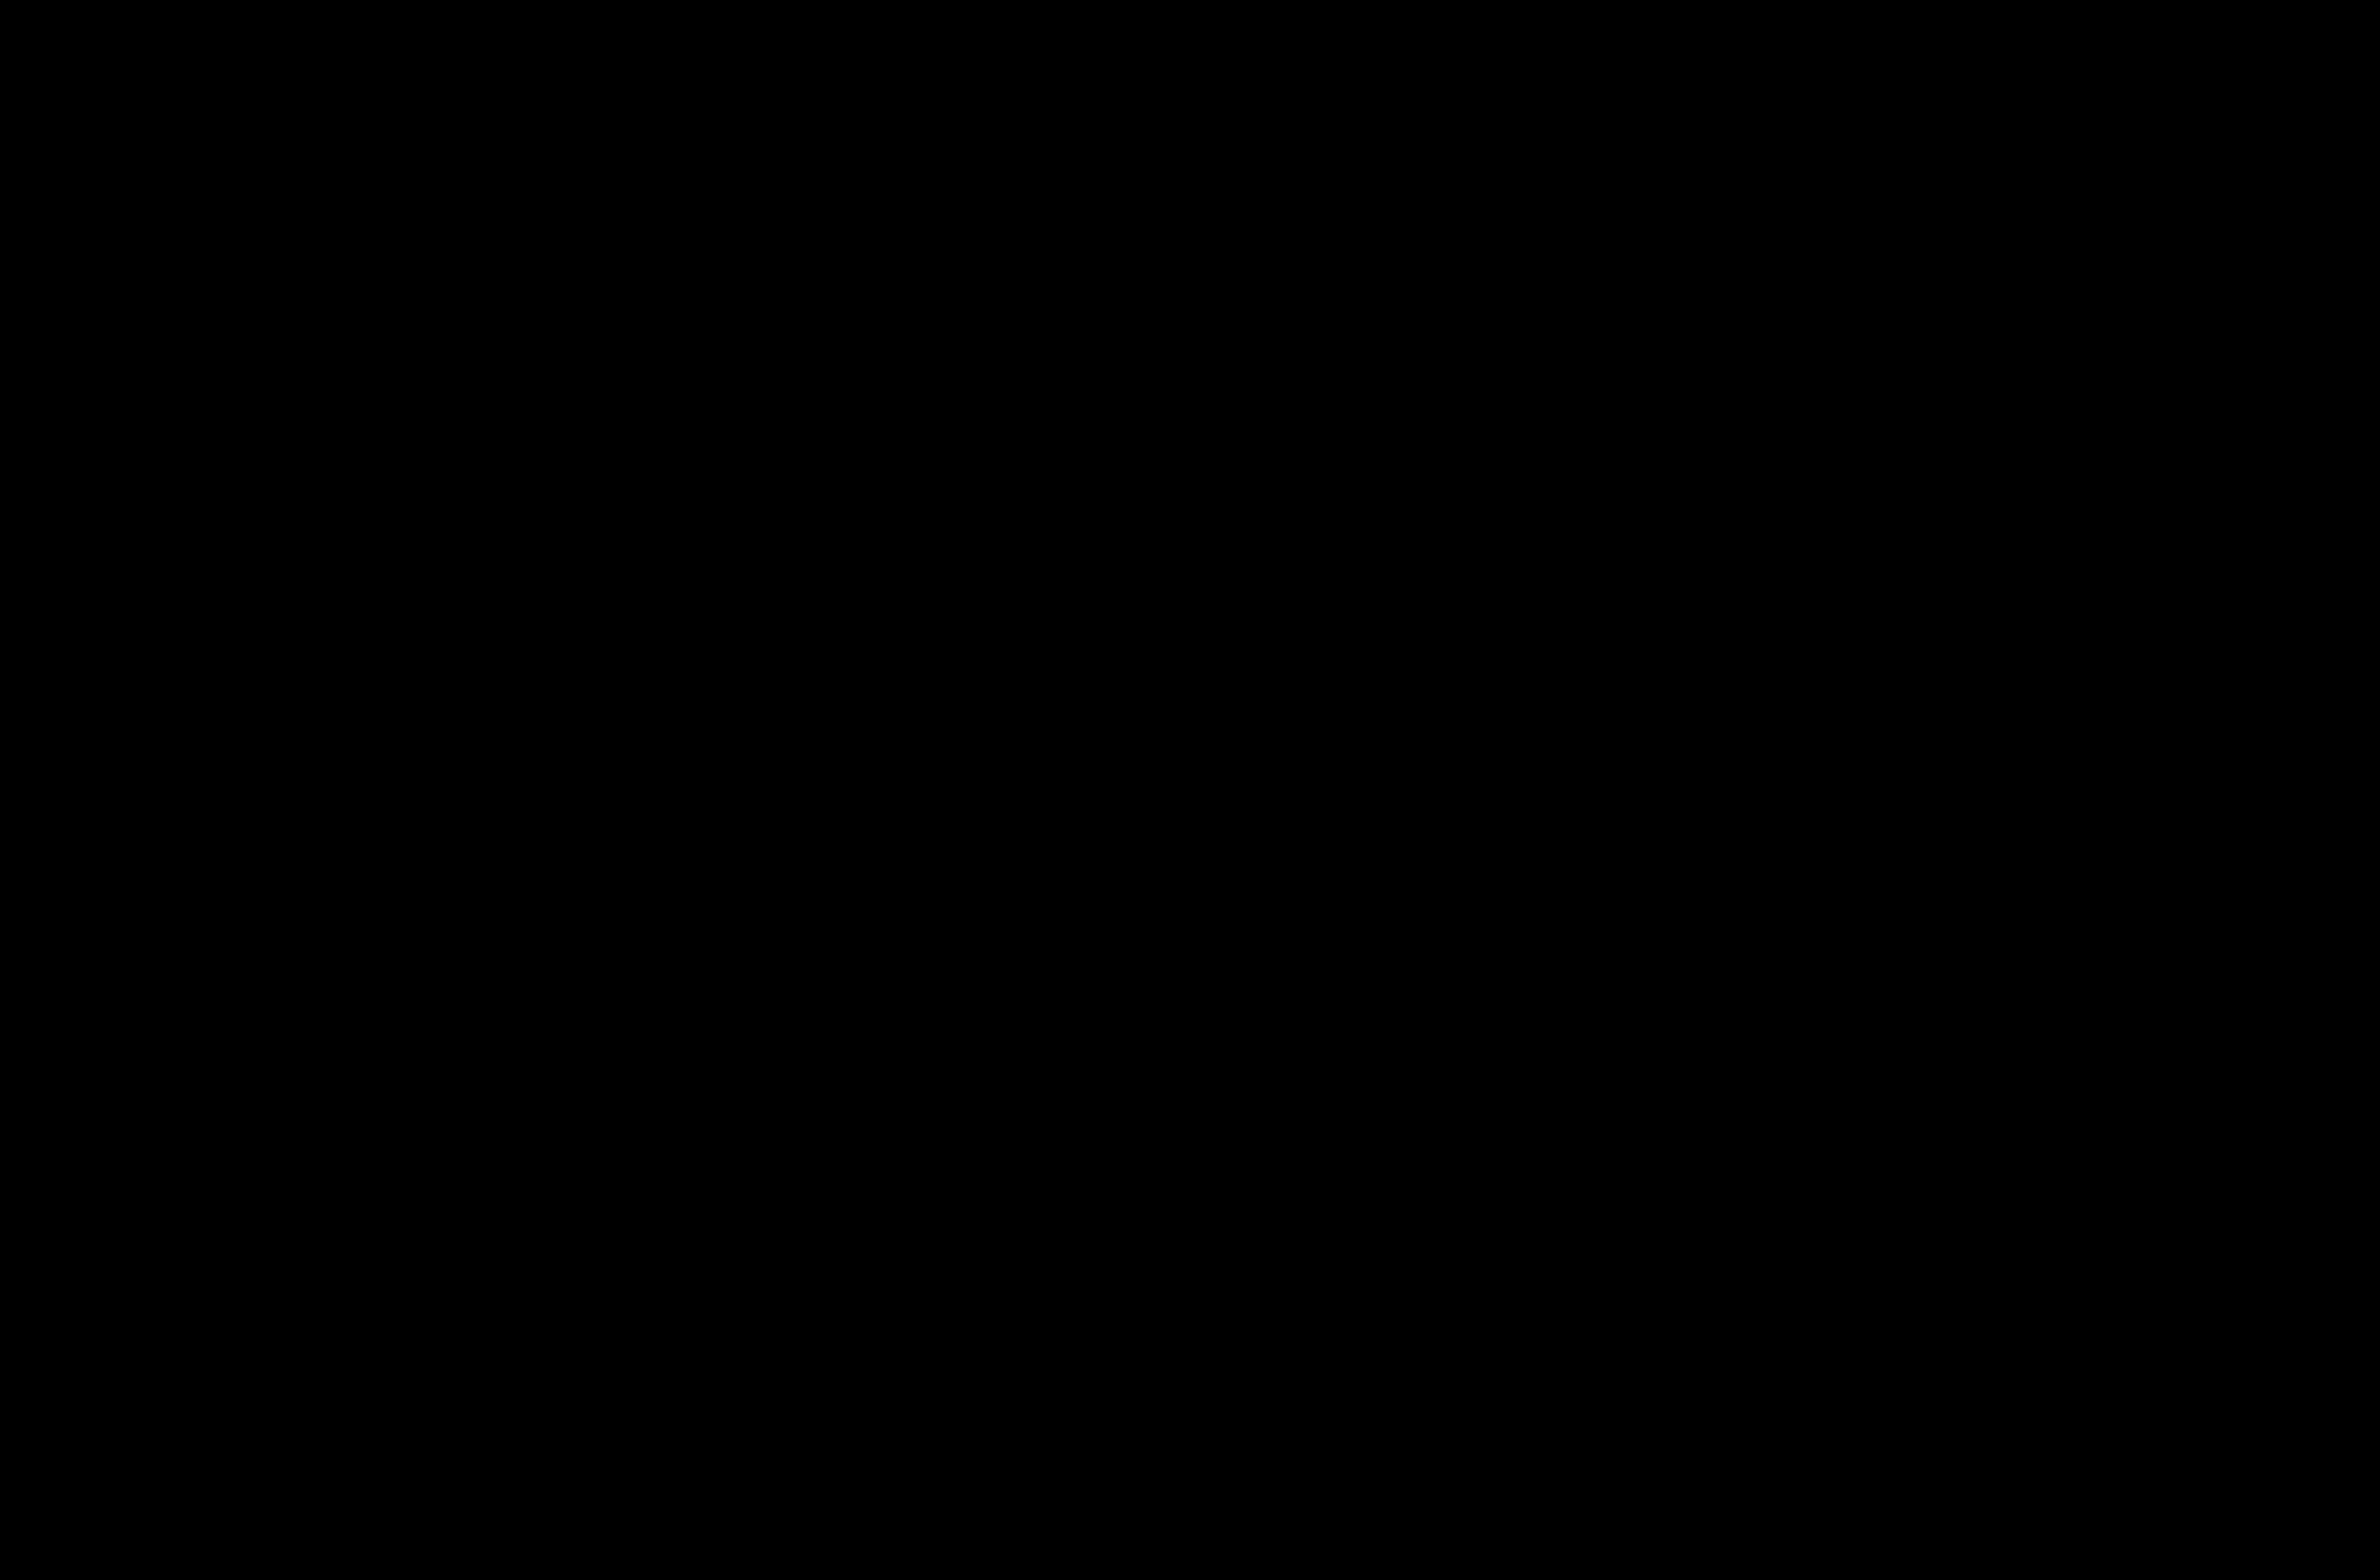 2400x1581 Clipart